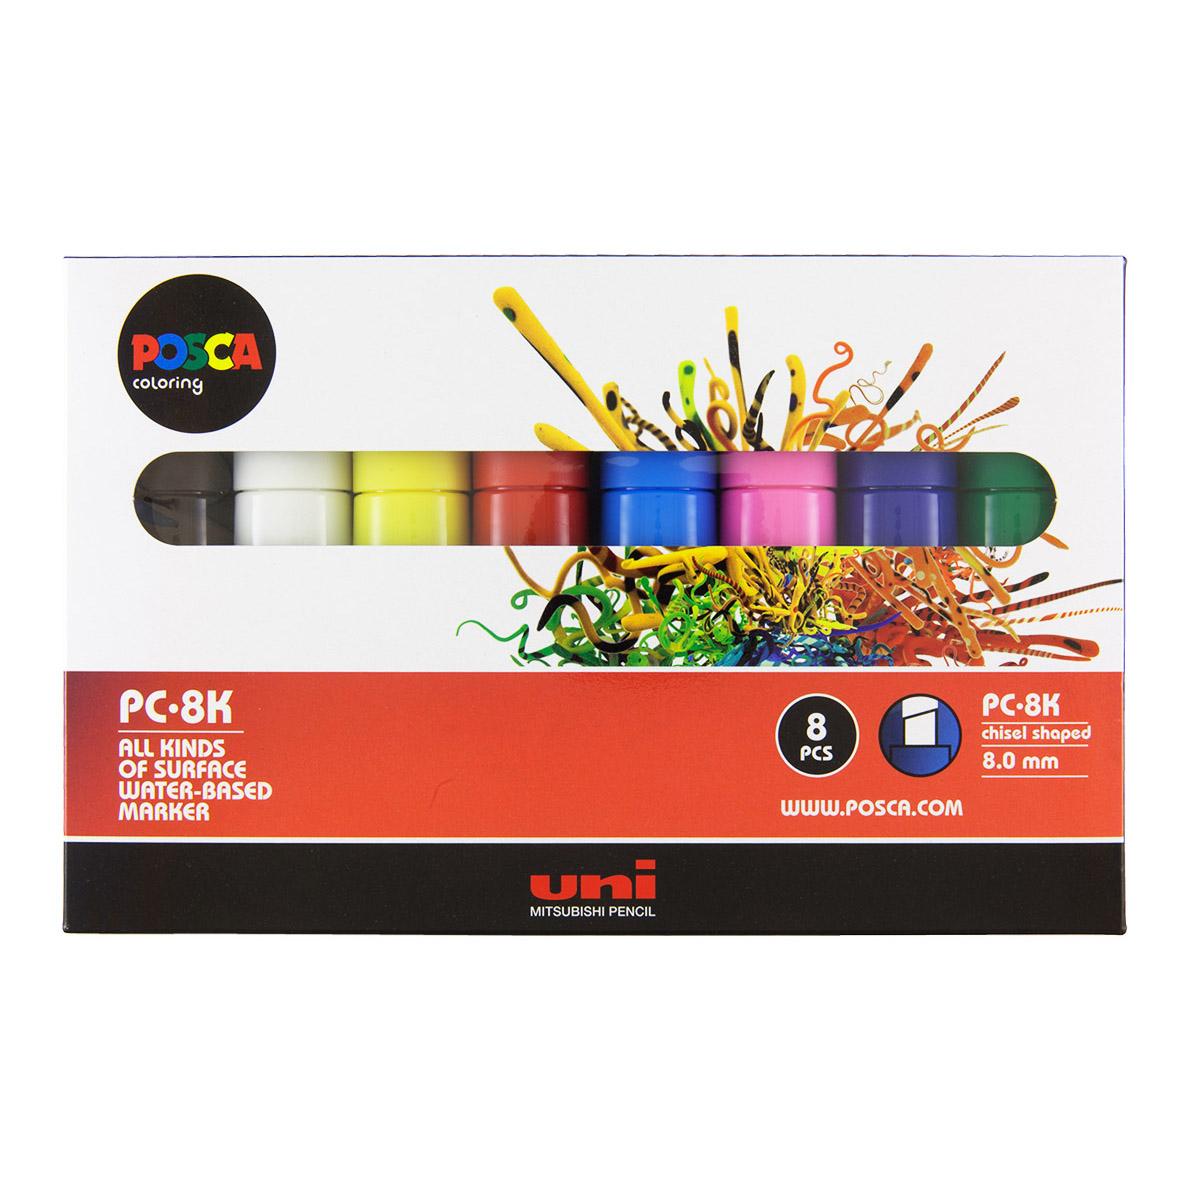 Uni Posca Marker PC-8K, 8set | Spraydaily.com